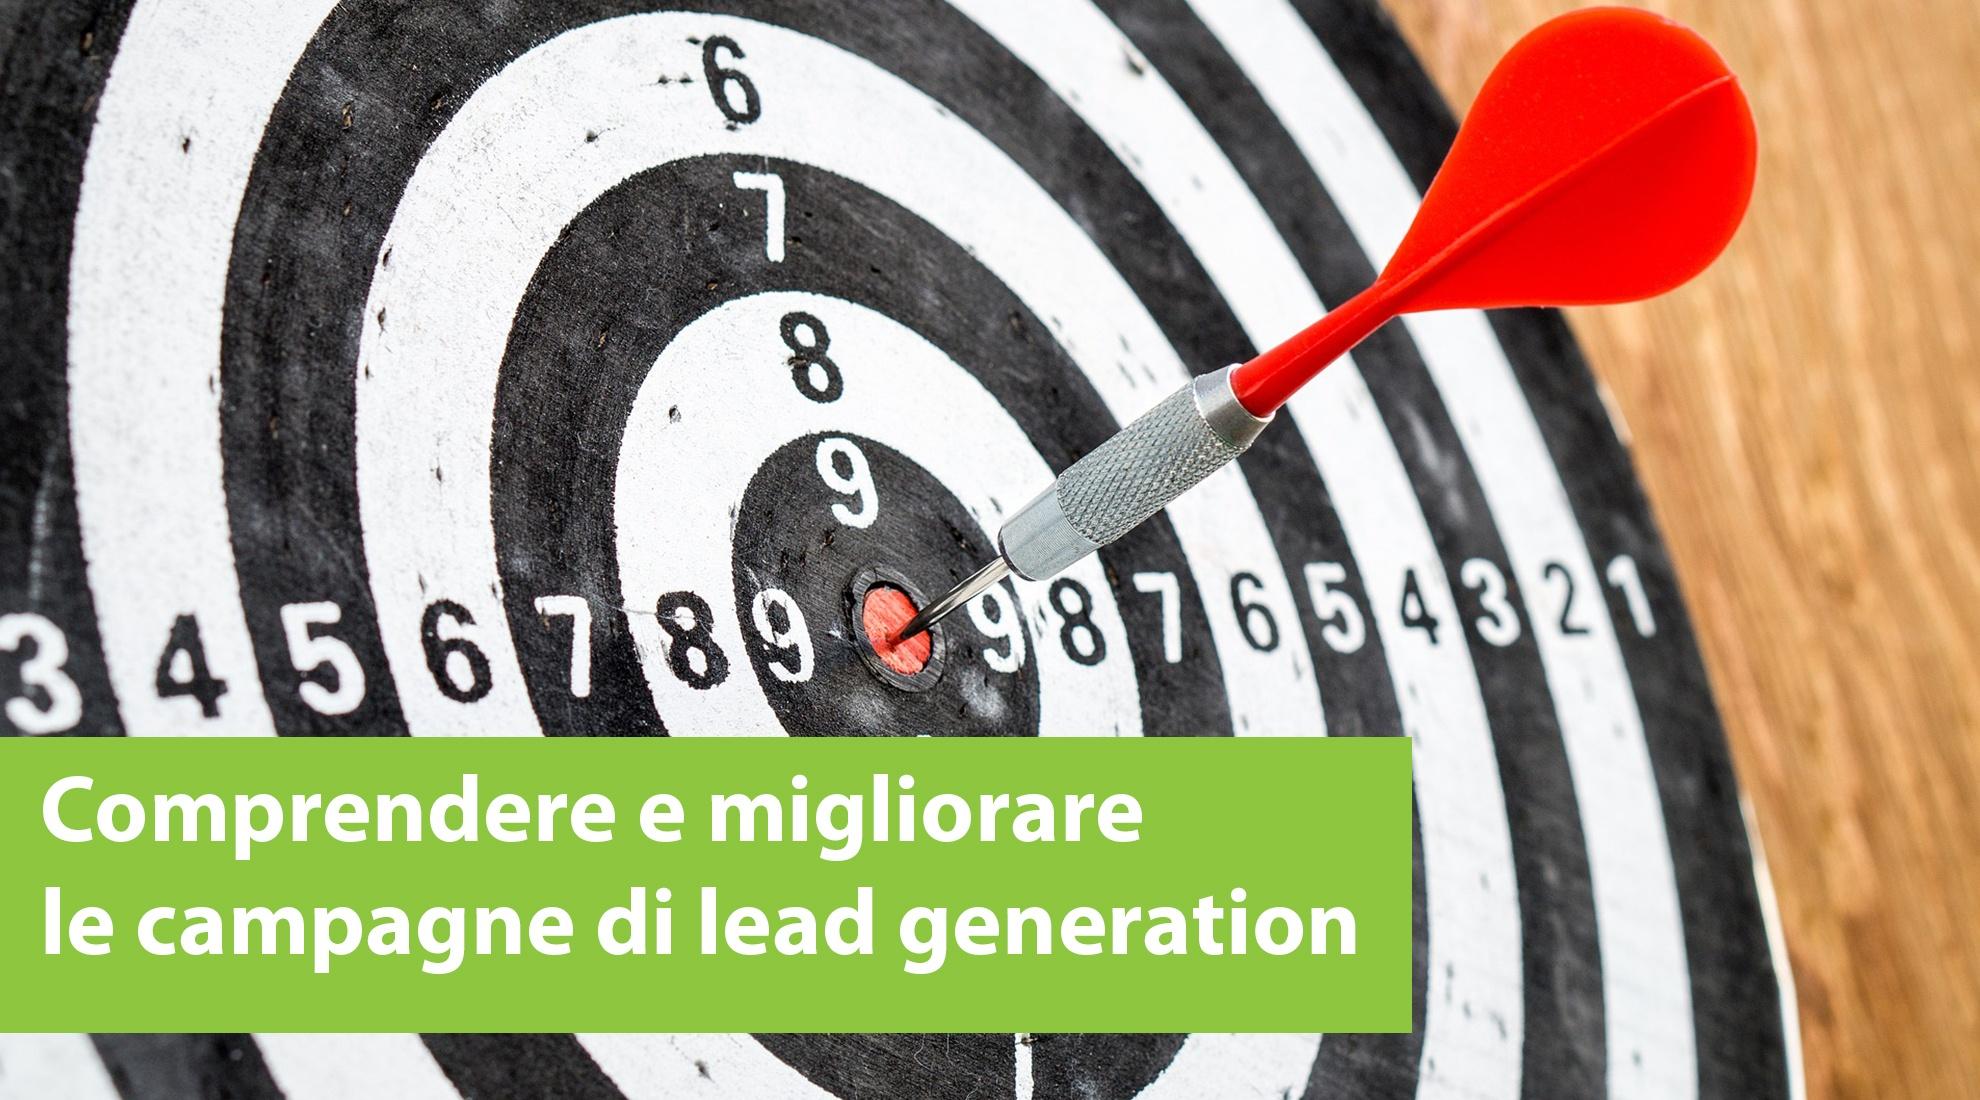 campagne-di-lead-generation.jpg